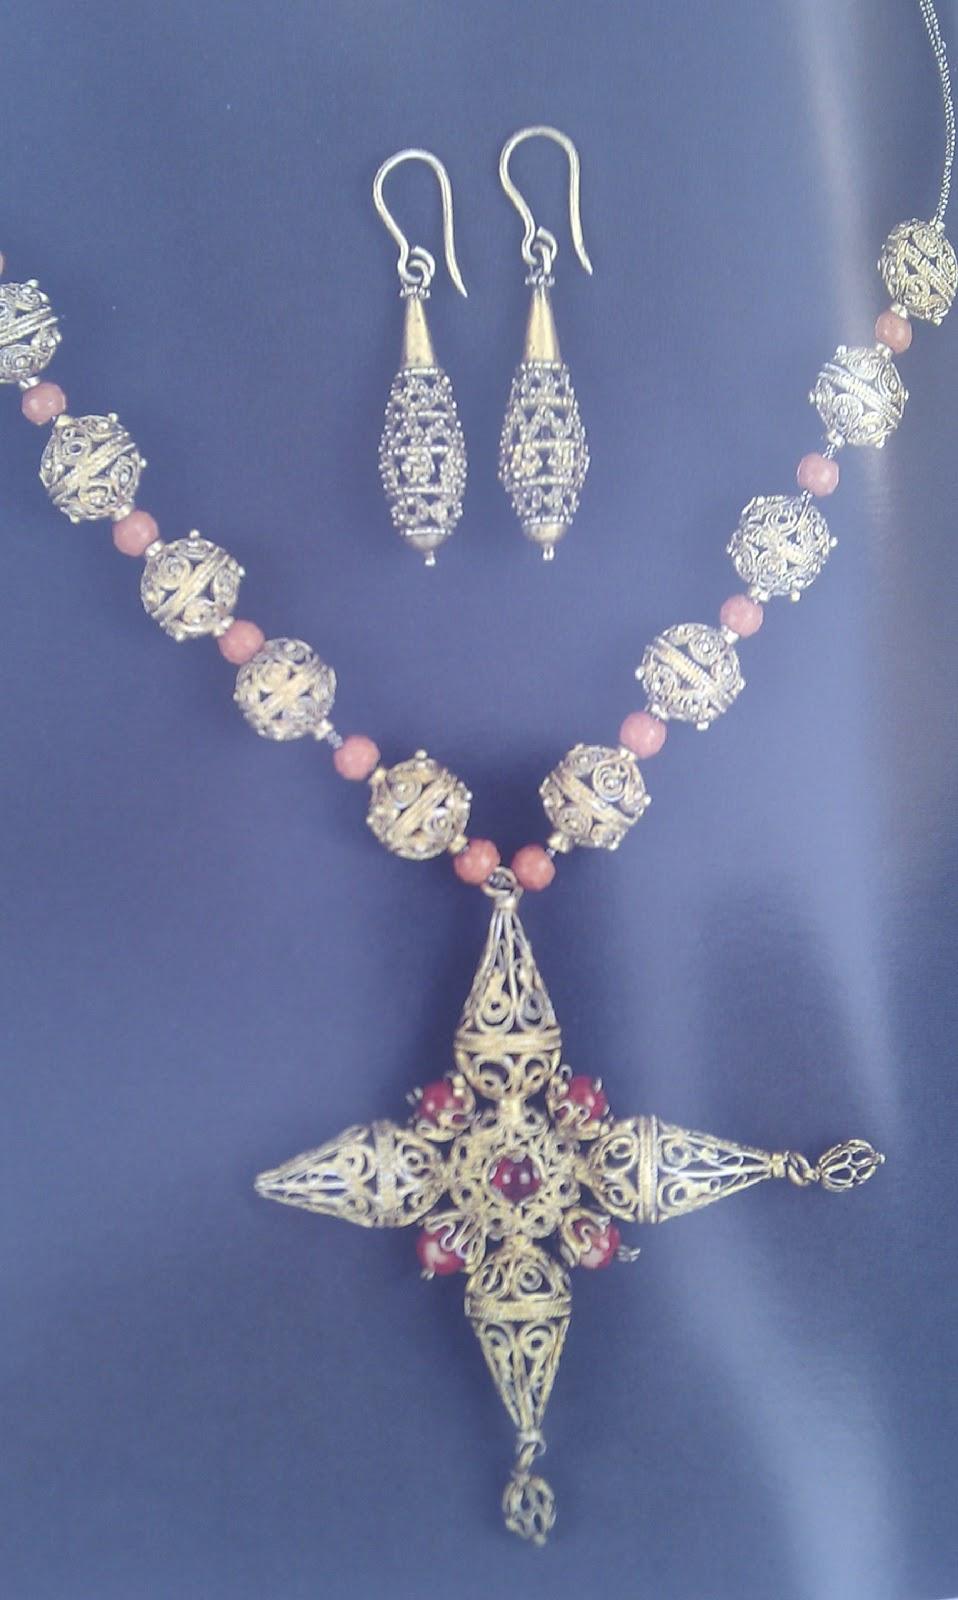 Eλλήνων Παράδοση  Τα παραδοσιακά κυπριακά γυναικεία κοσμήματα 16ef0587746